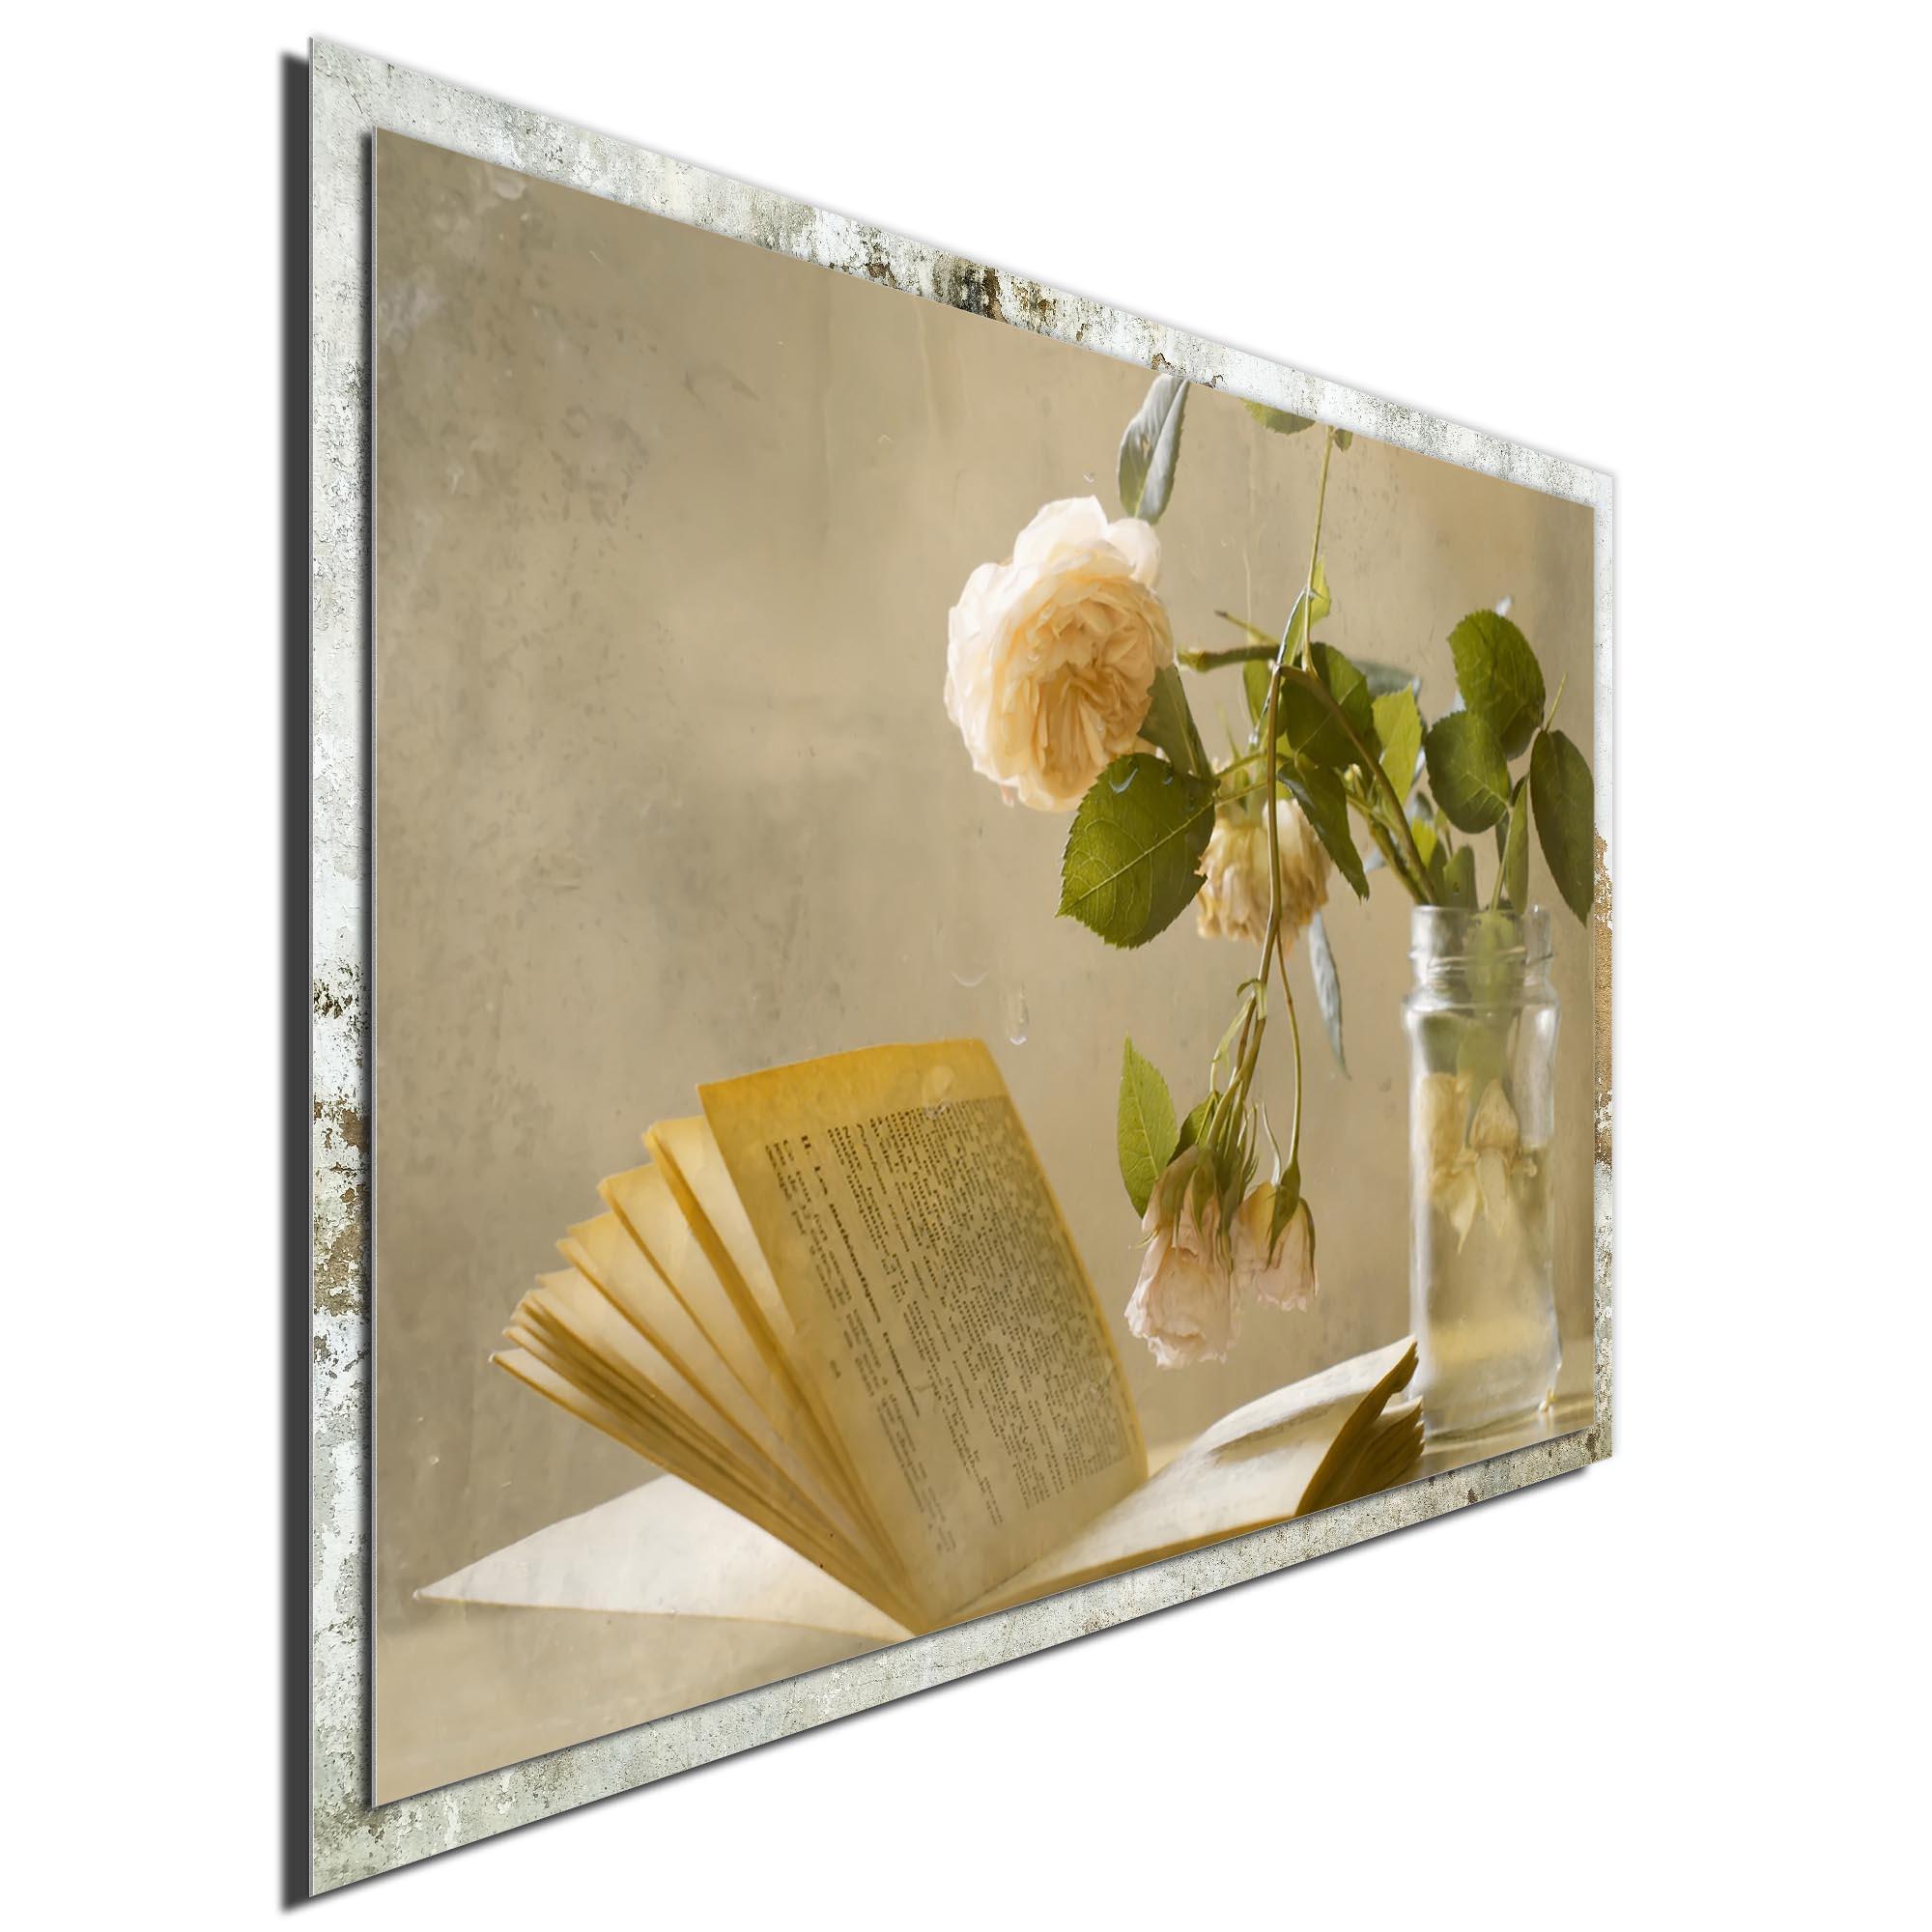 Enjoying a Rainy Day by Delphine Devos - Modern Farmhouse Floral on Metal - Image 2